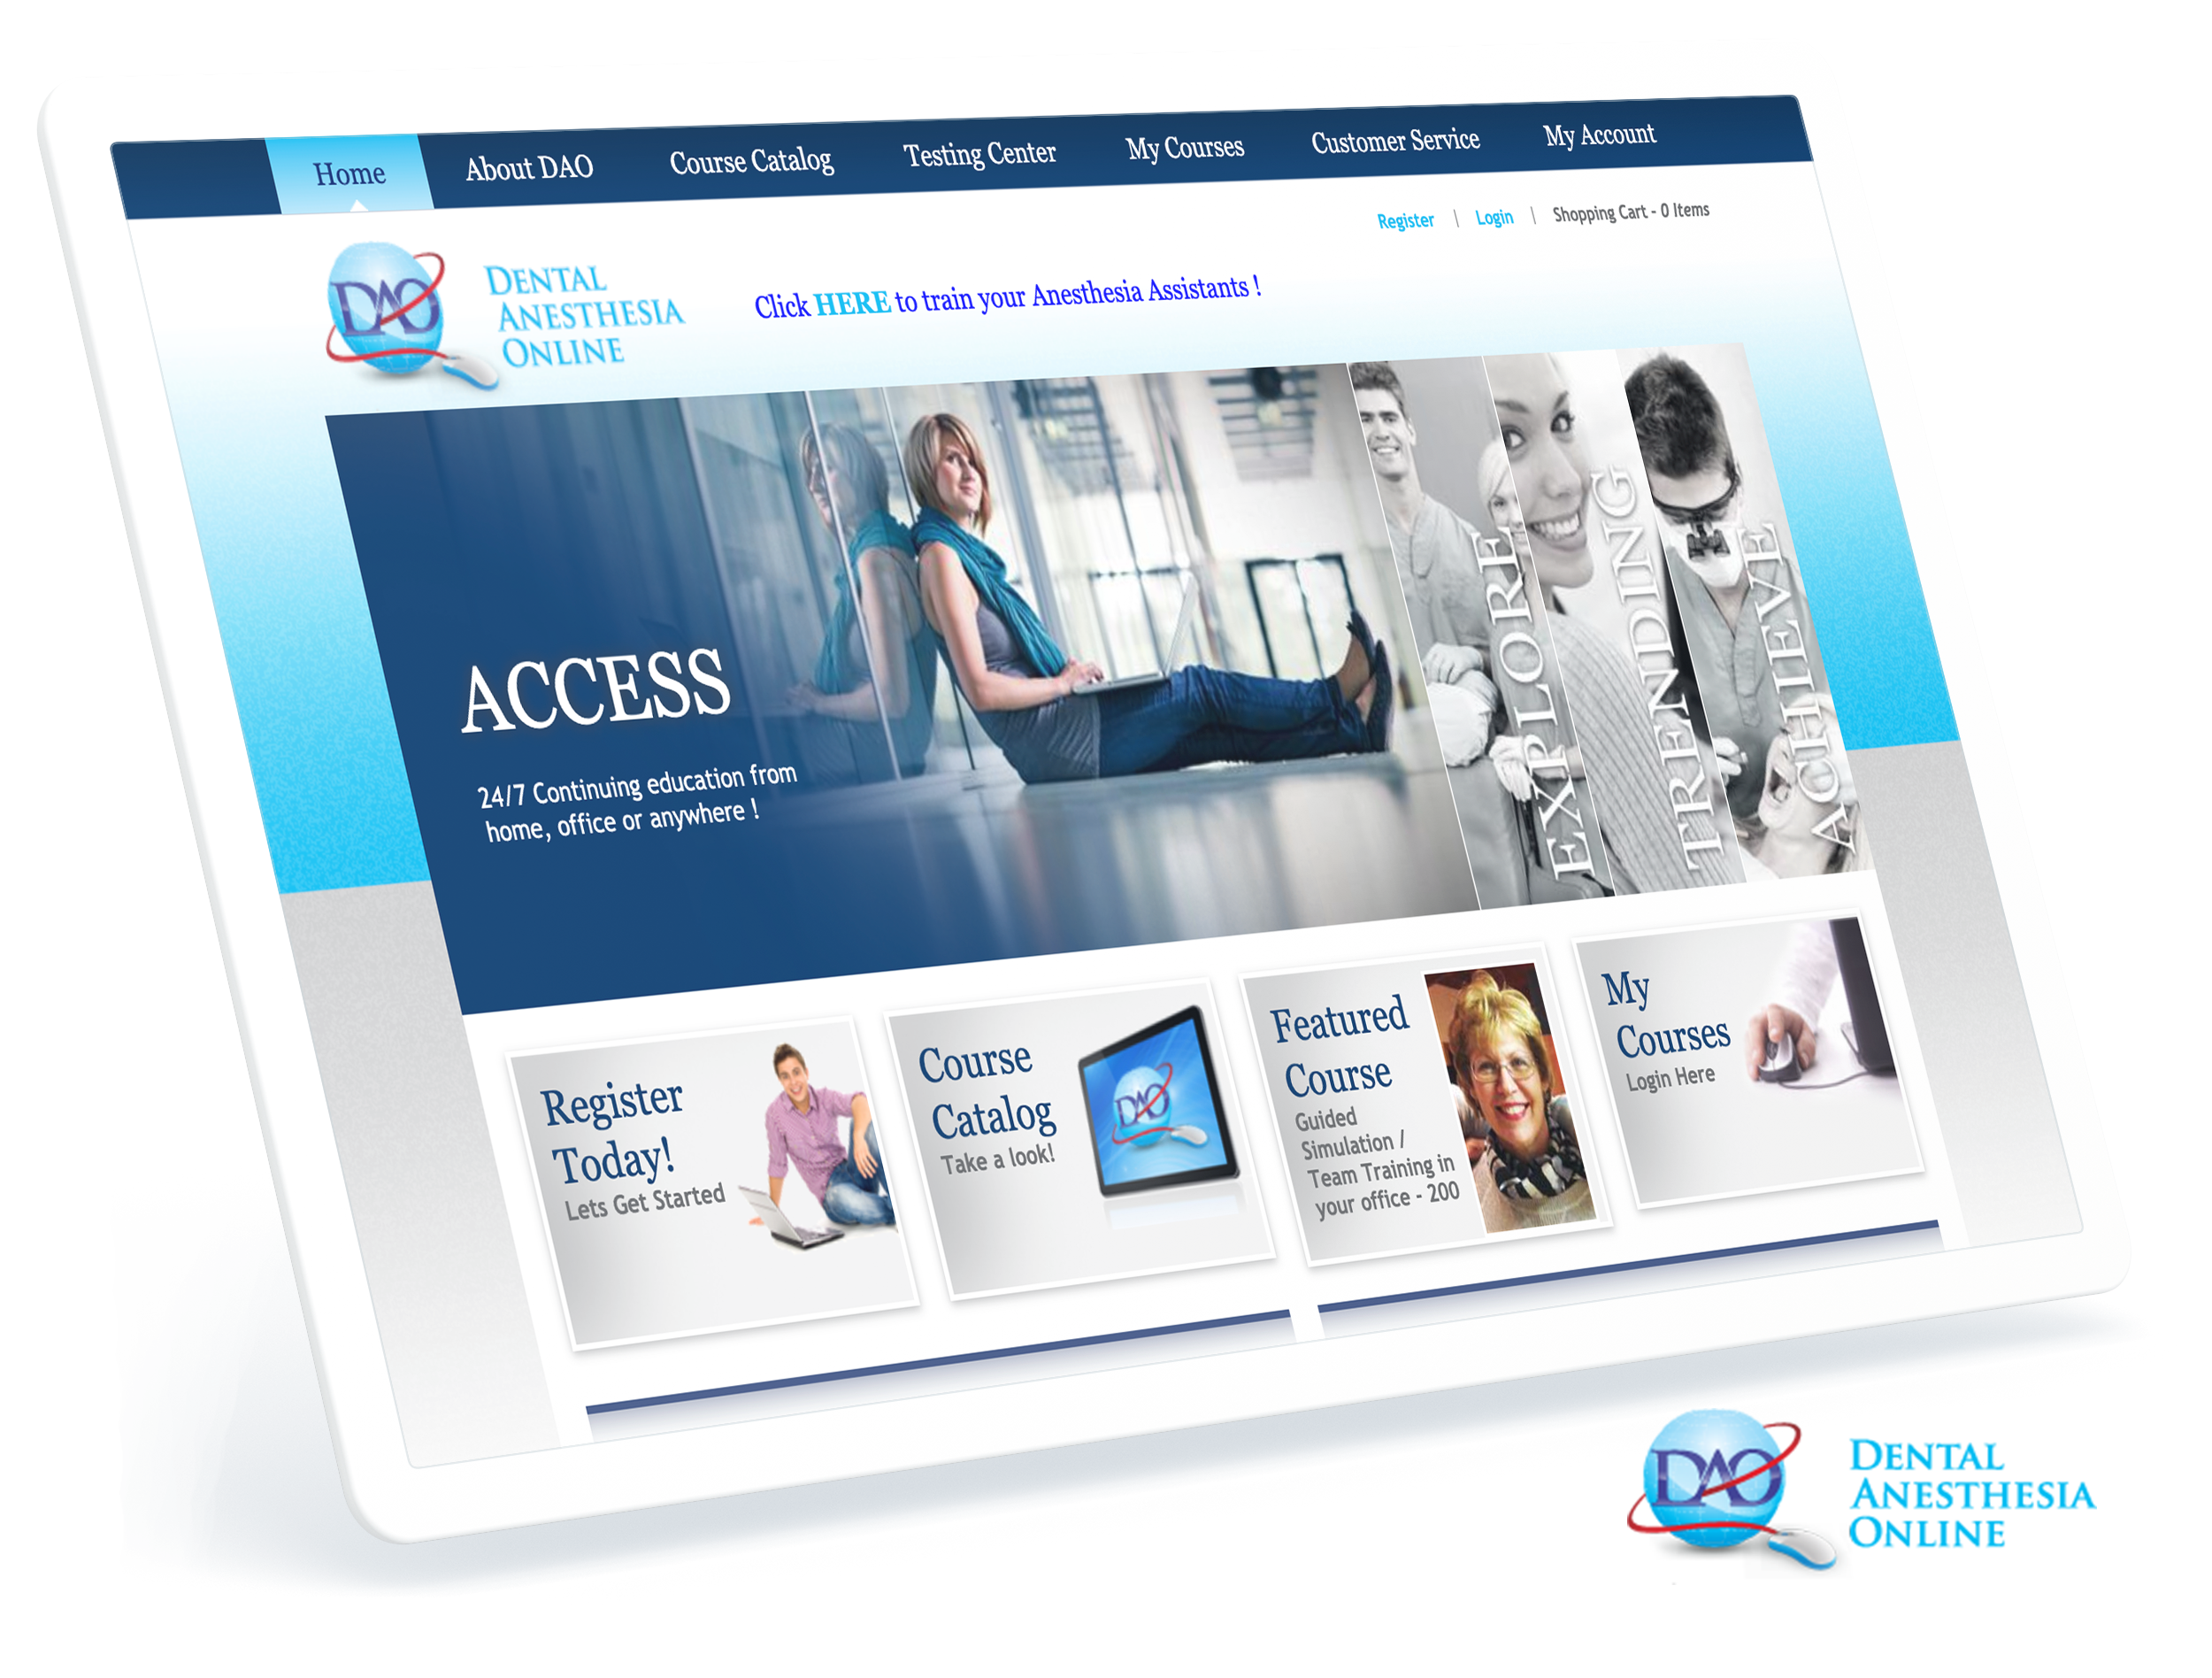 Dental Anesthesia Online Screens